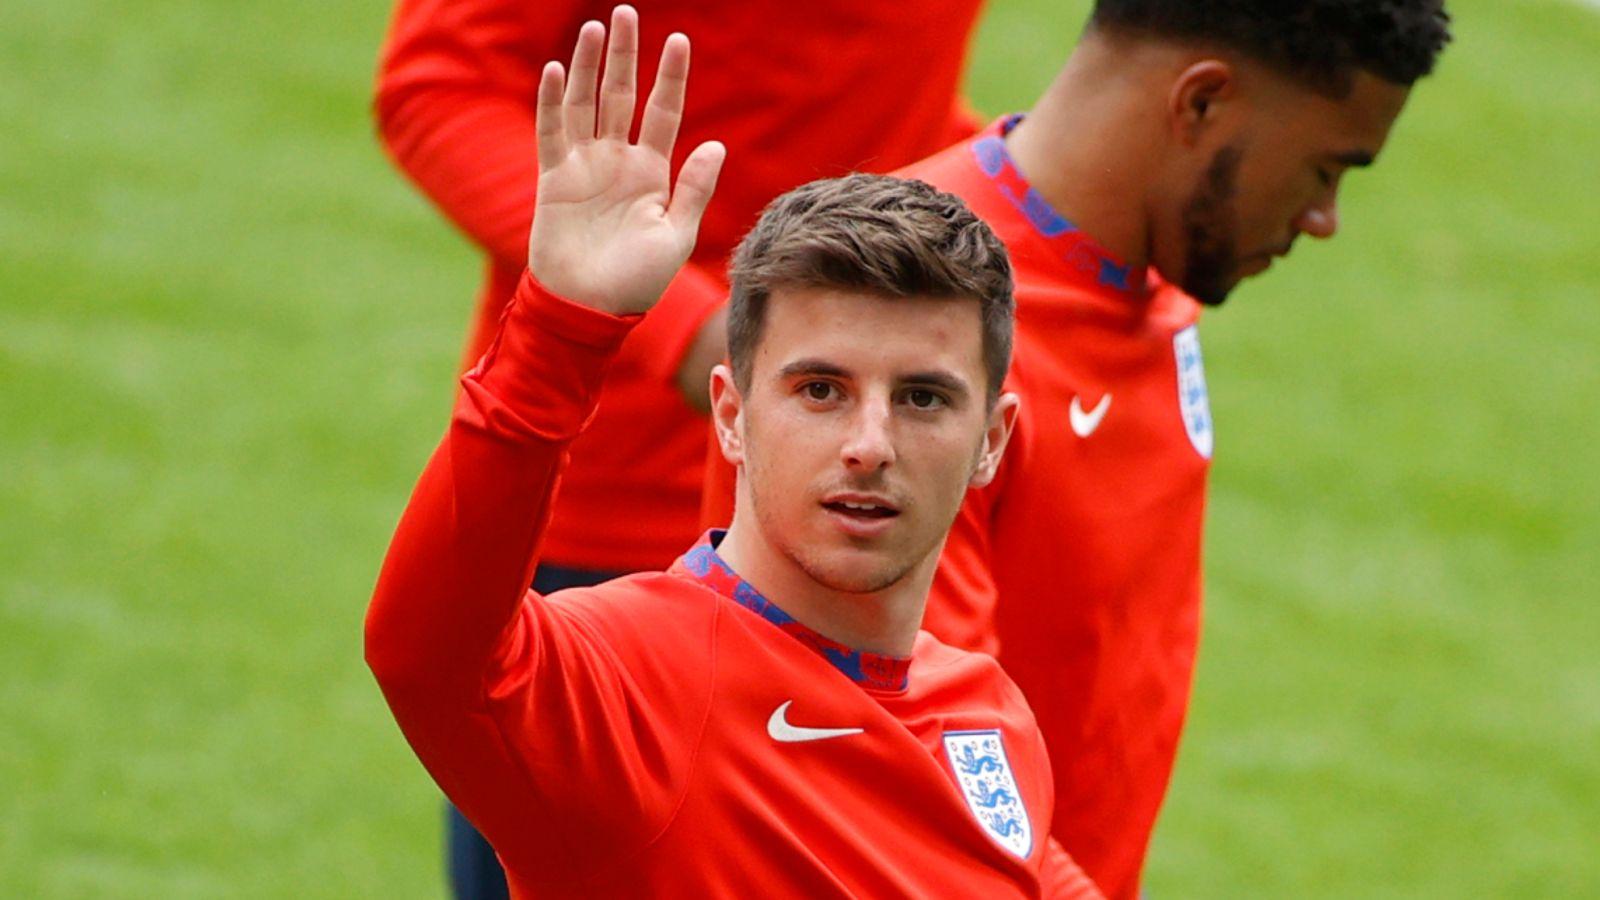 Mason Mount: England midfielder expected to start in Euro 2020 quarter-final against Ukraine